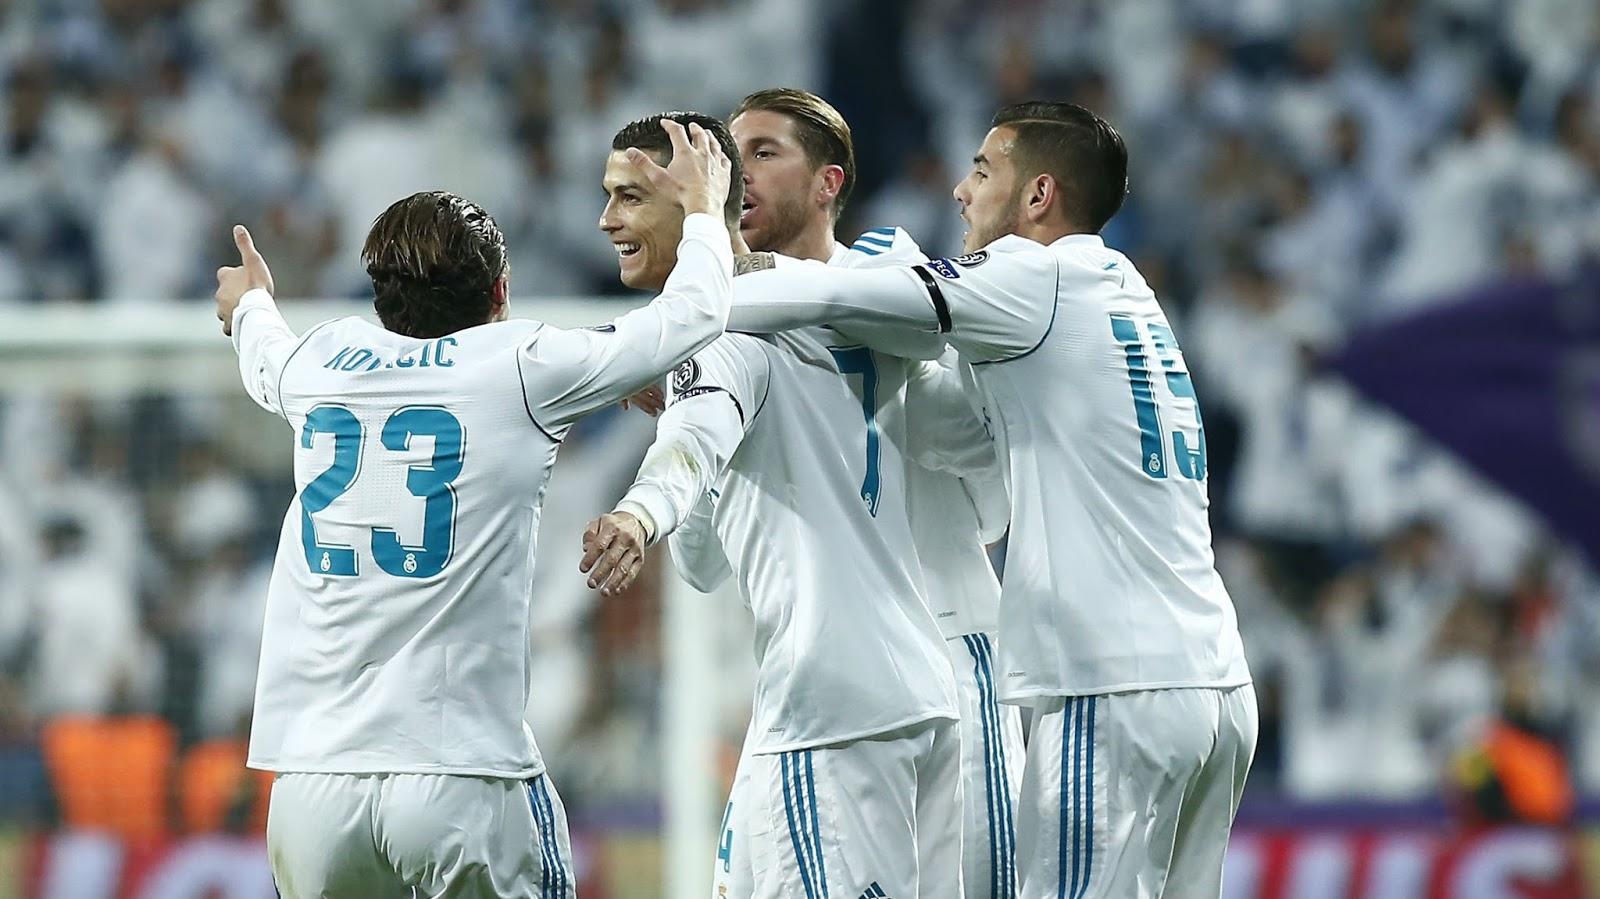 Ronaldo-co-ky-luc-nhung-Real-khong-con-dang-so-2